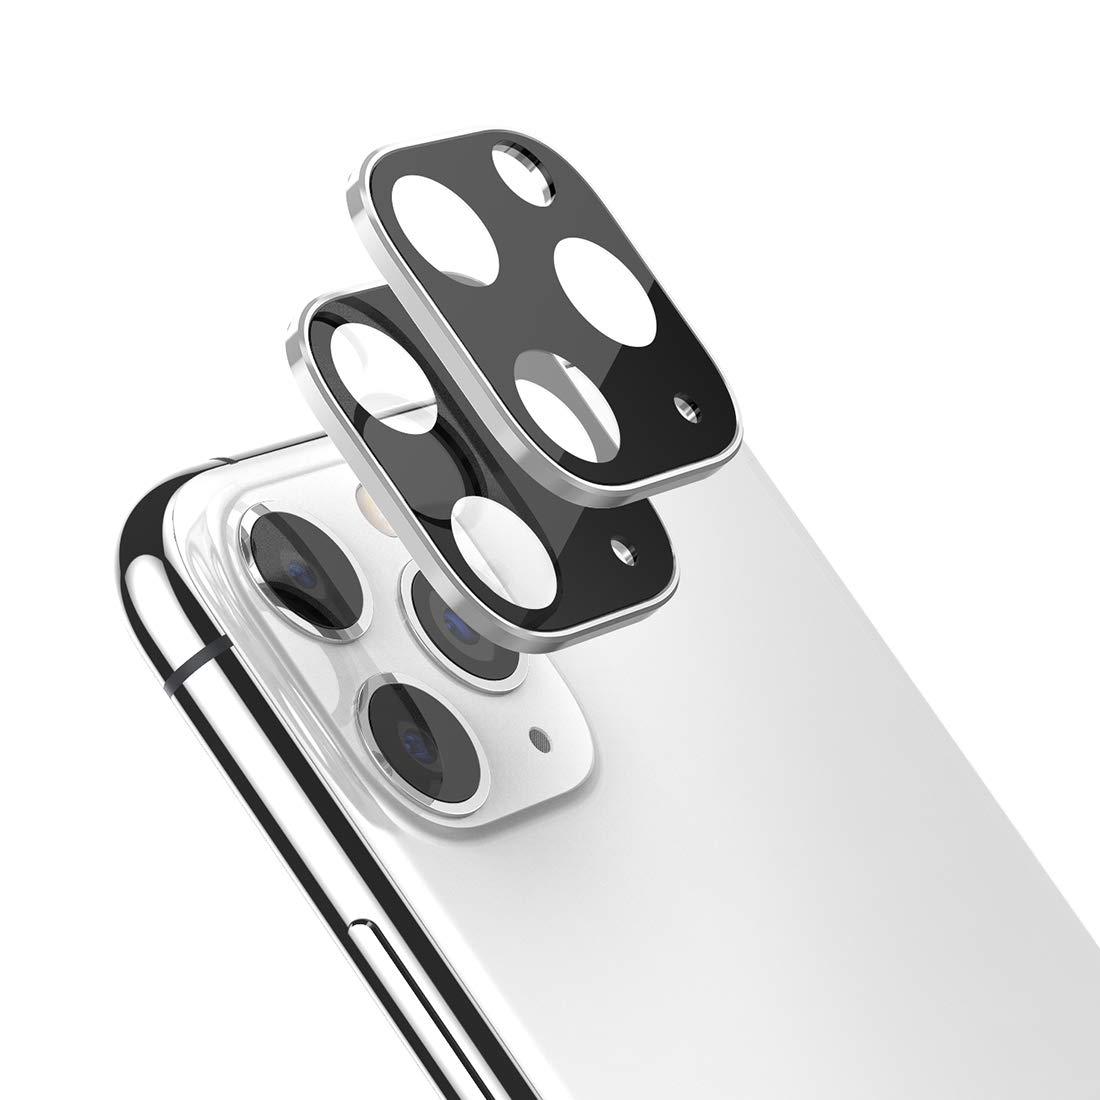 2 Vidrios Templados Para Camaras iPhone 11 Pro Max, Plateado